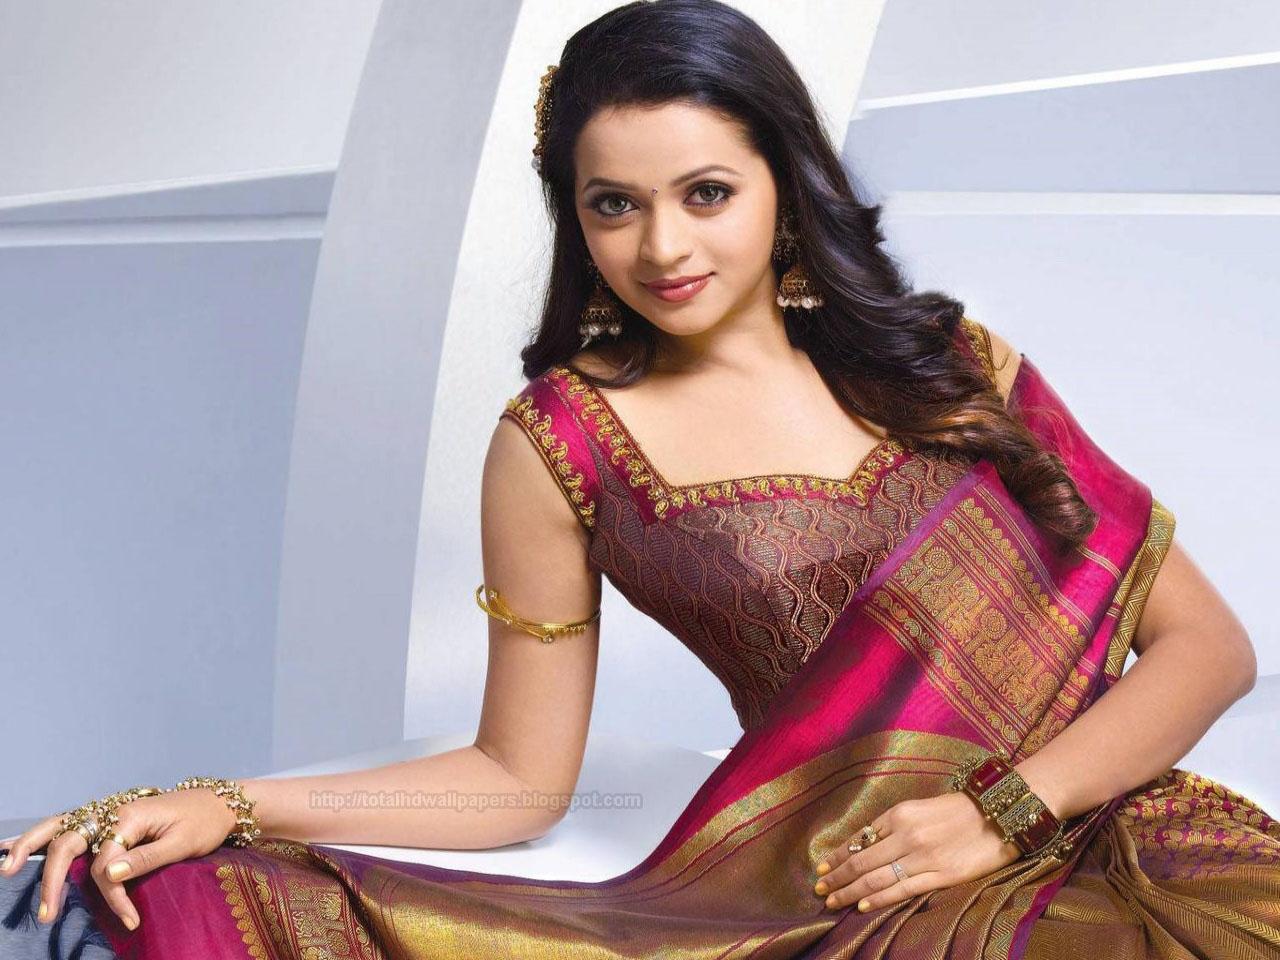 Punjabi Beautiful Girl Wallpaper Download Hd Wallpapers Bollywood Actress High Quality Wallpapers